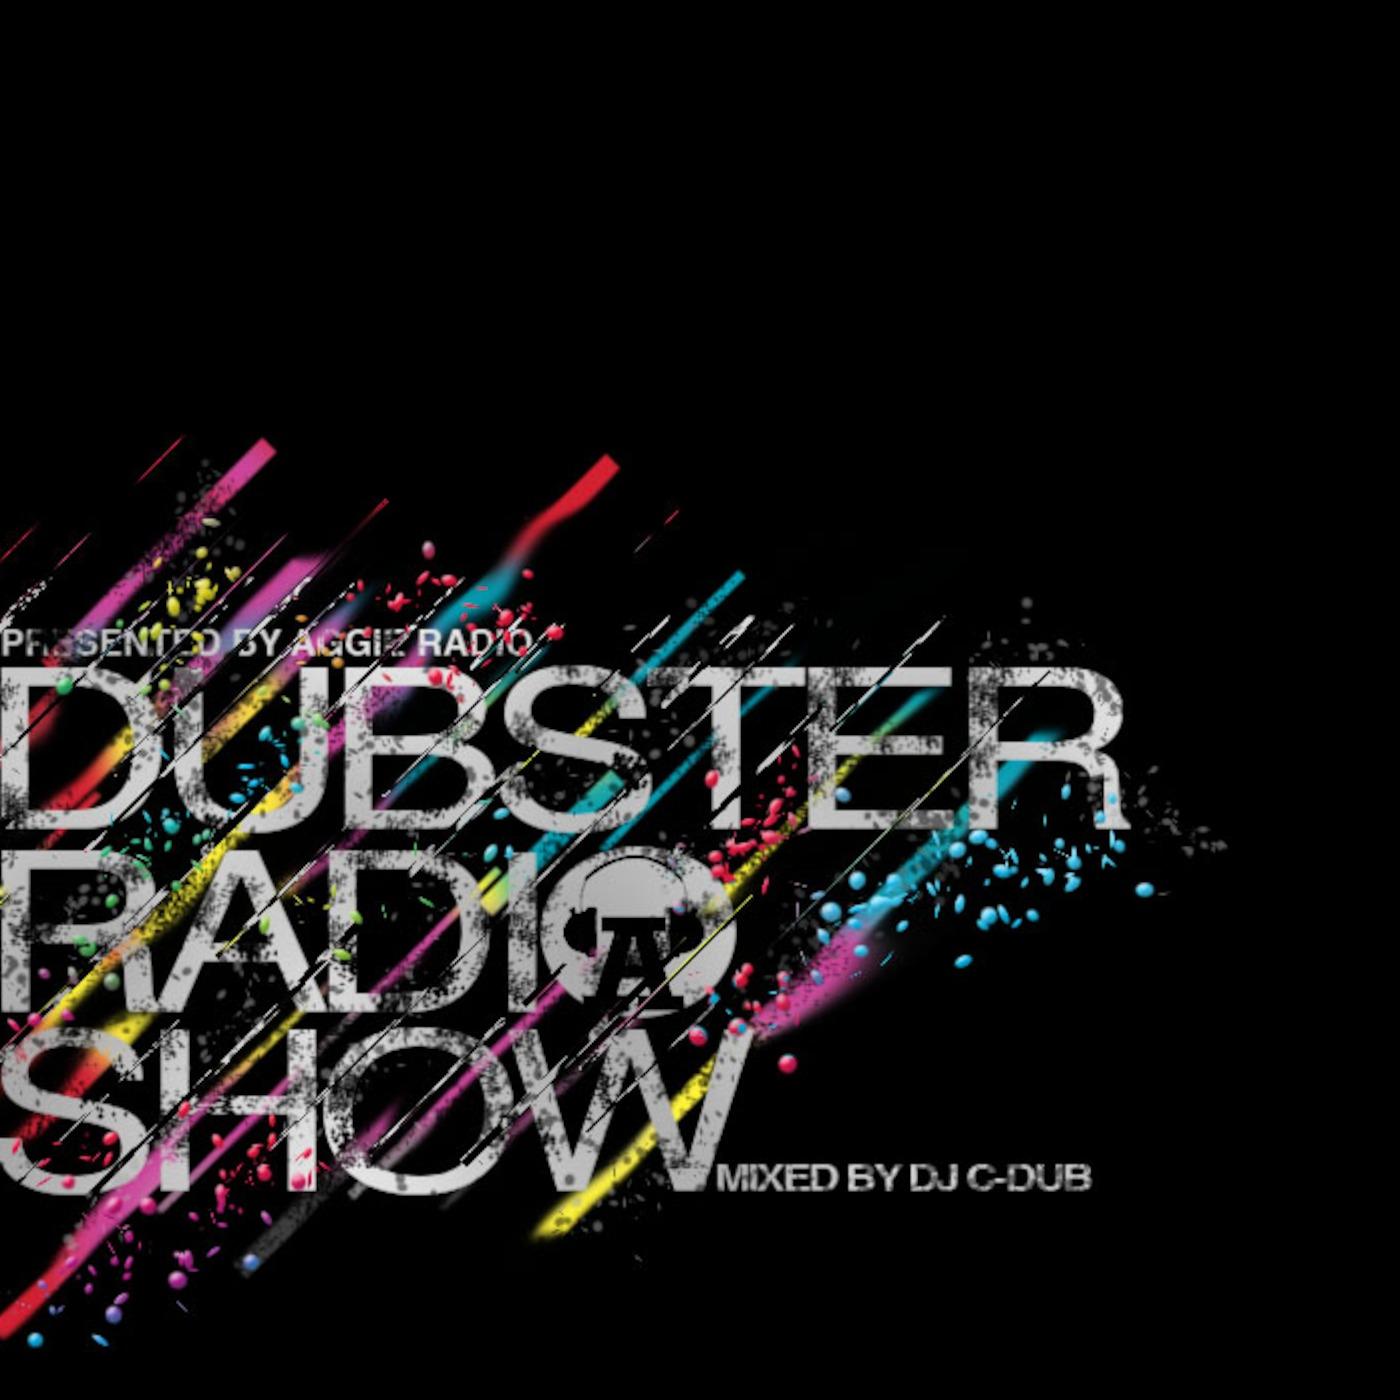 Dubster Radio